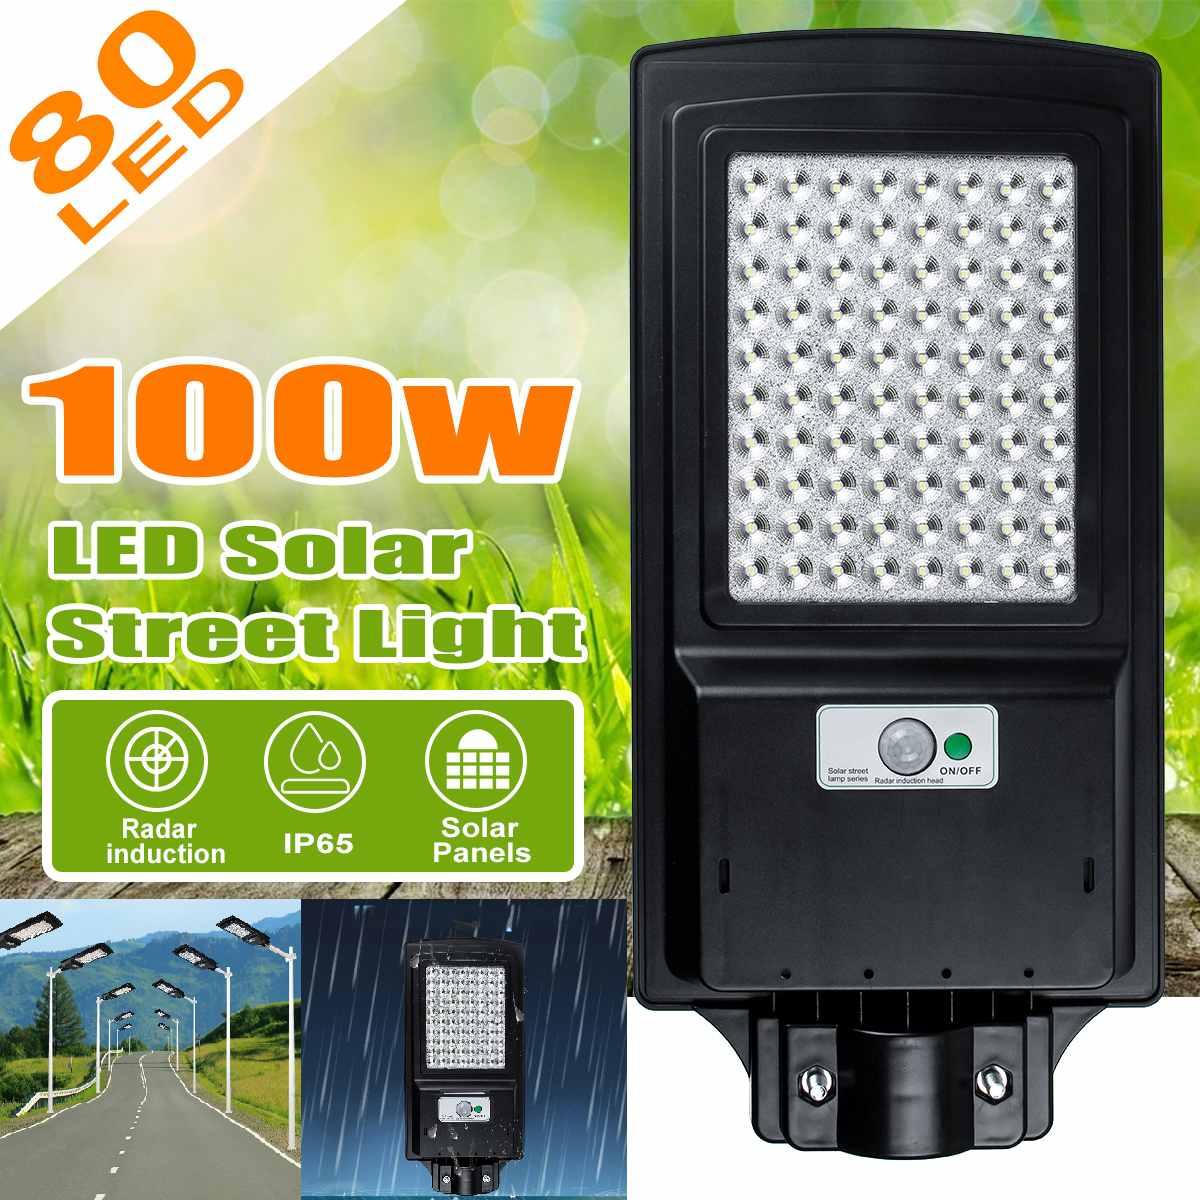 100W 80 LEDs Wall Lamp IP65 Waterproof Solar Street Light Radar Motion Street Lamp Solar Powered Light For Outdoor Garden